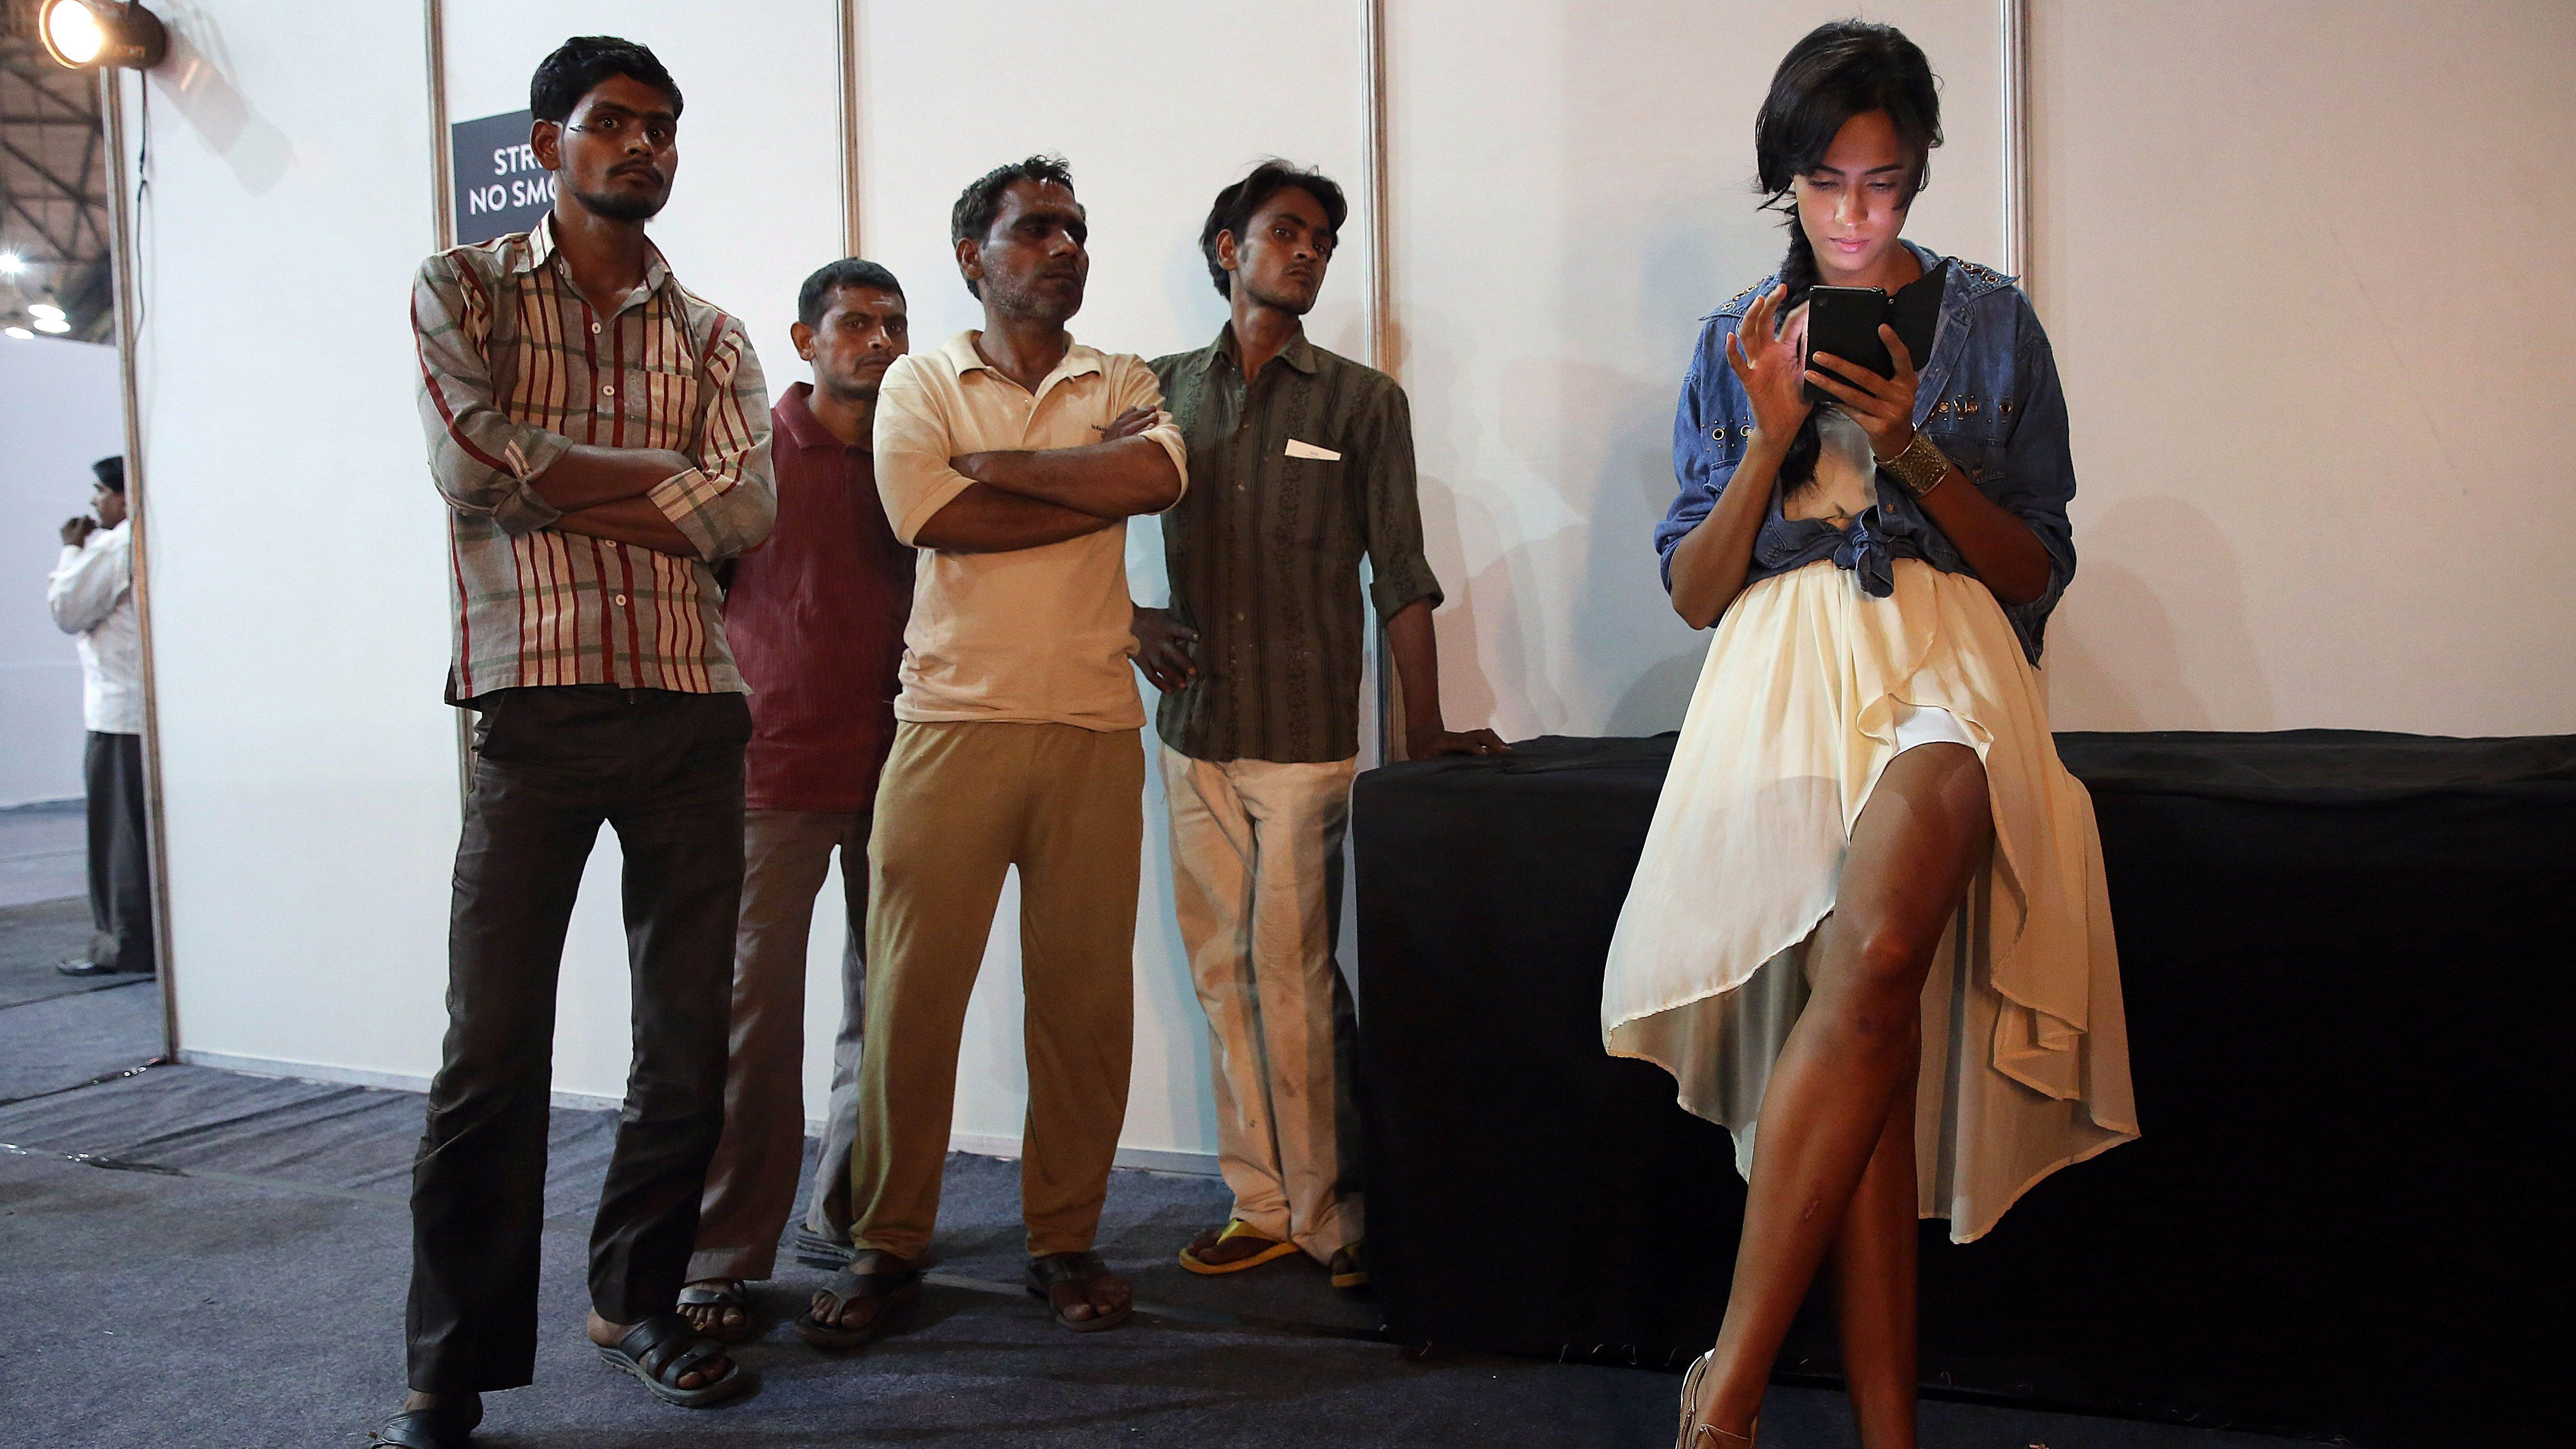 How Priyanka Chopra-backed dating app Bumble is winning